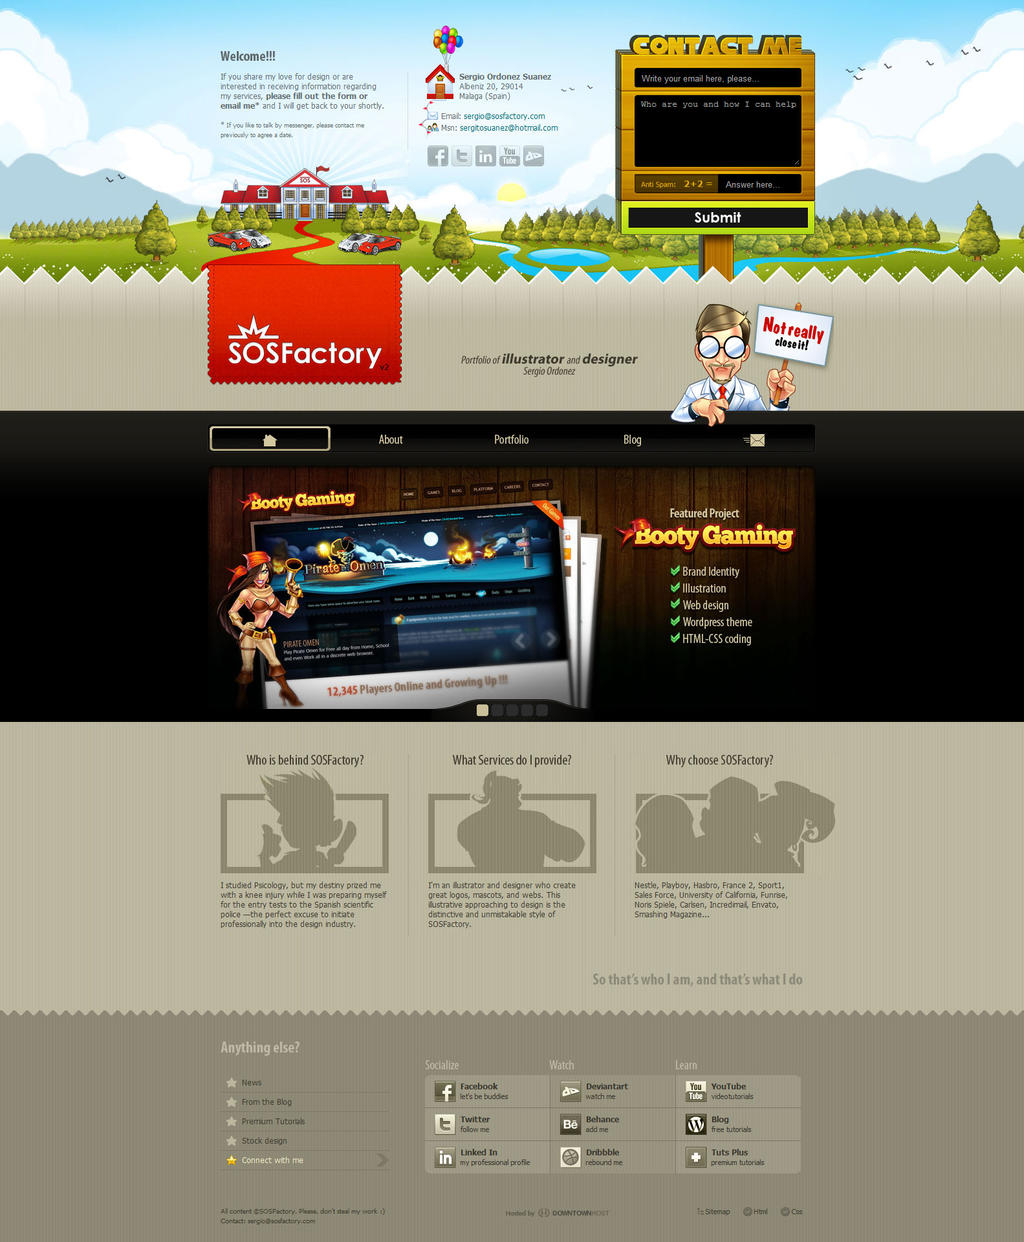 Web design: SOSFactory v2.0 by SOSFactory